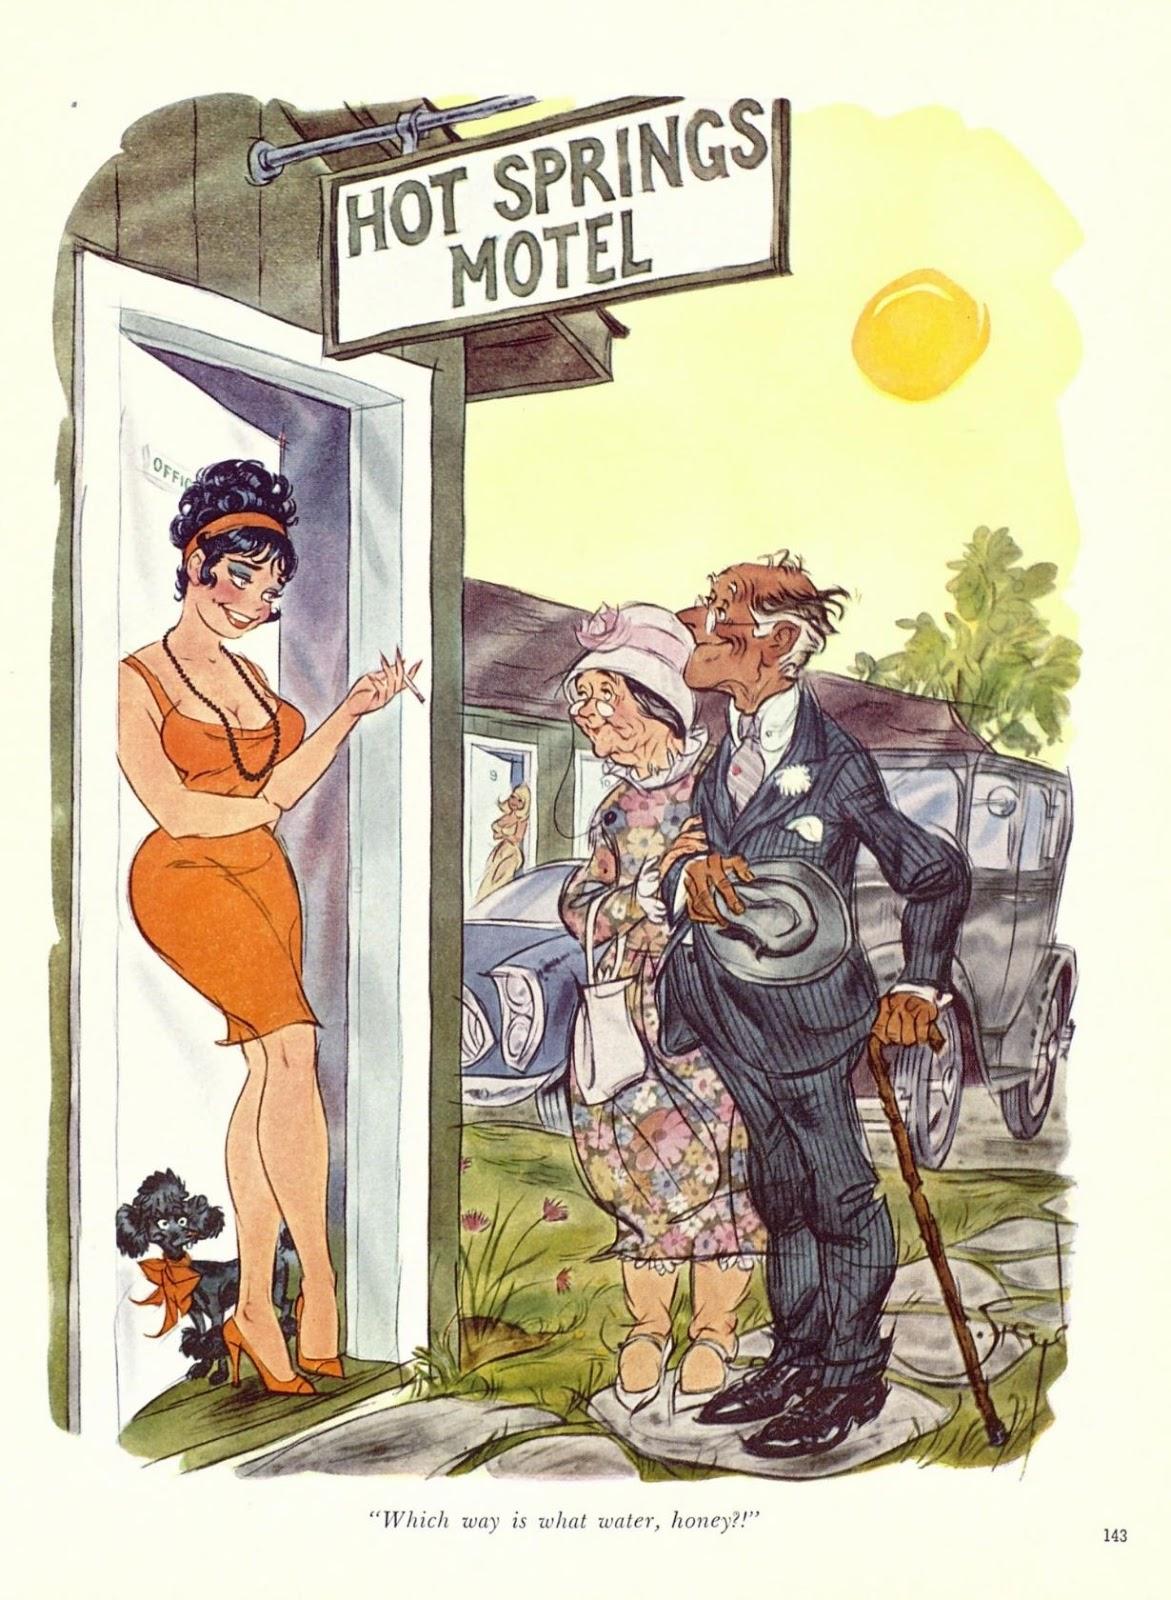 Doug Sneyd - Playboy Cartoons, 1960S  Vintage Arts Gallery-5819